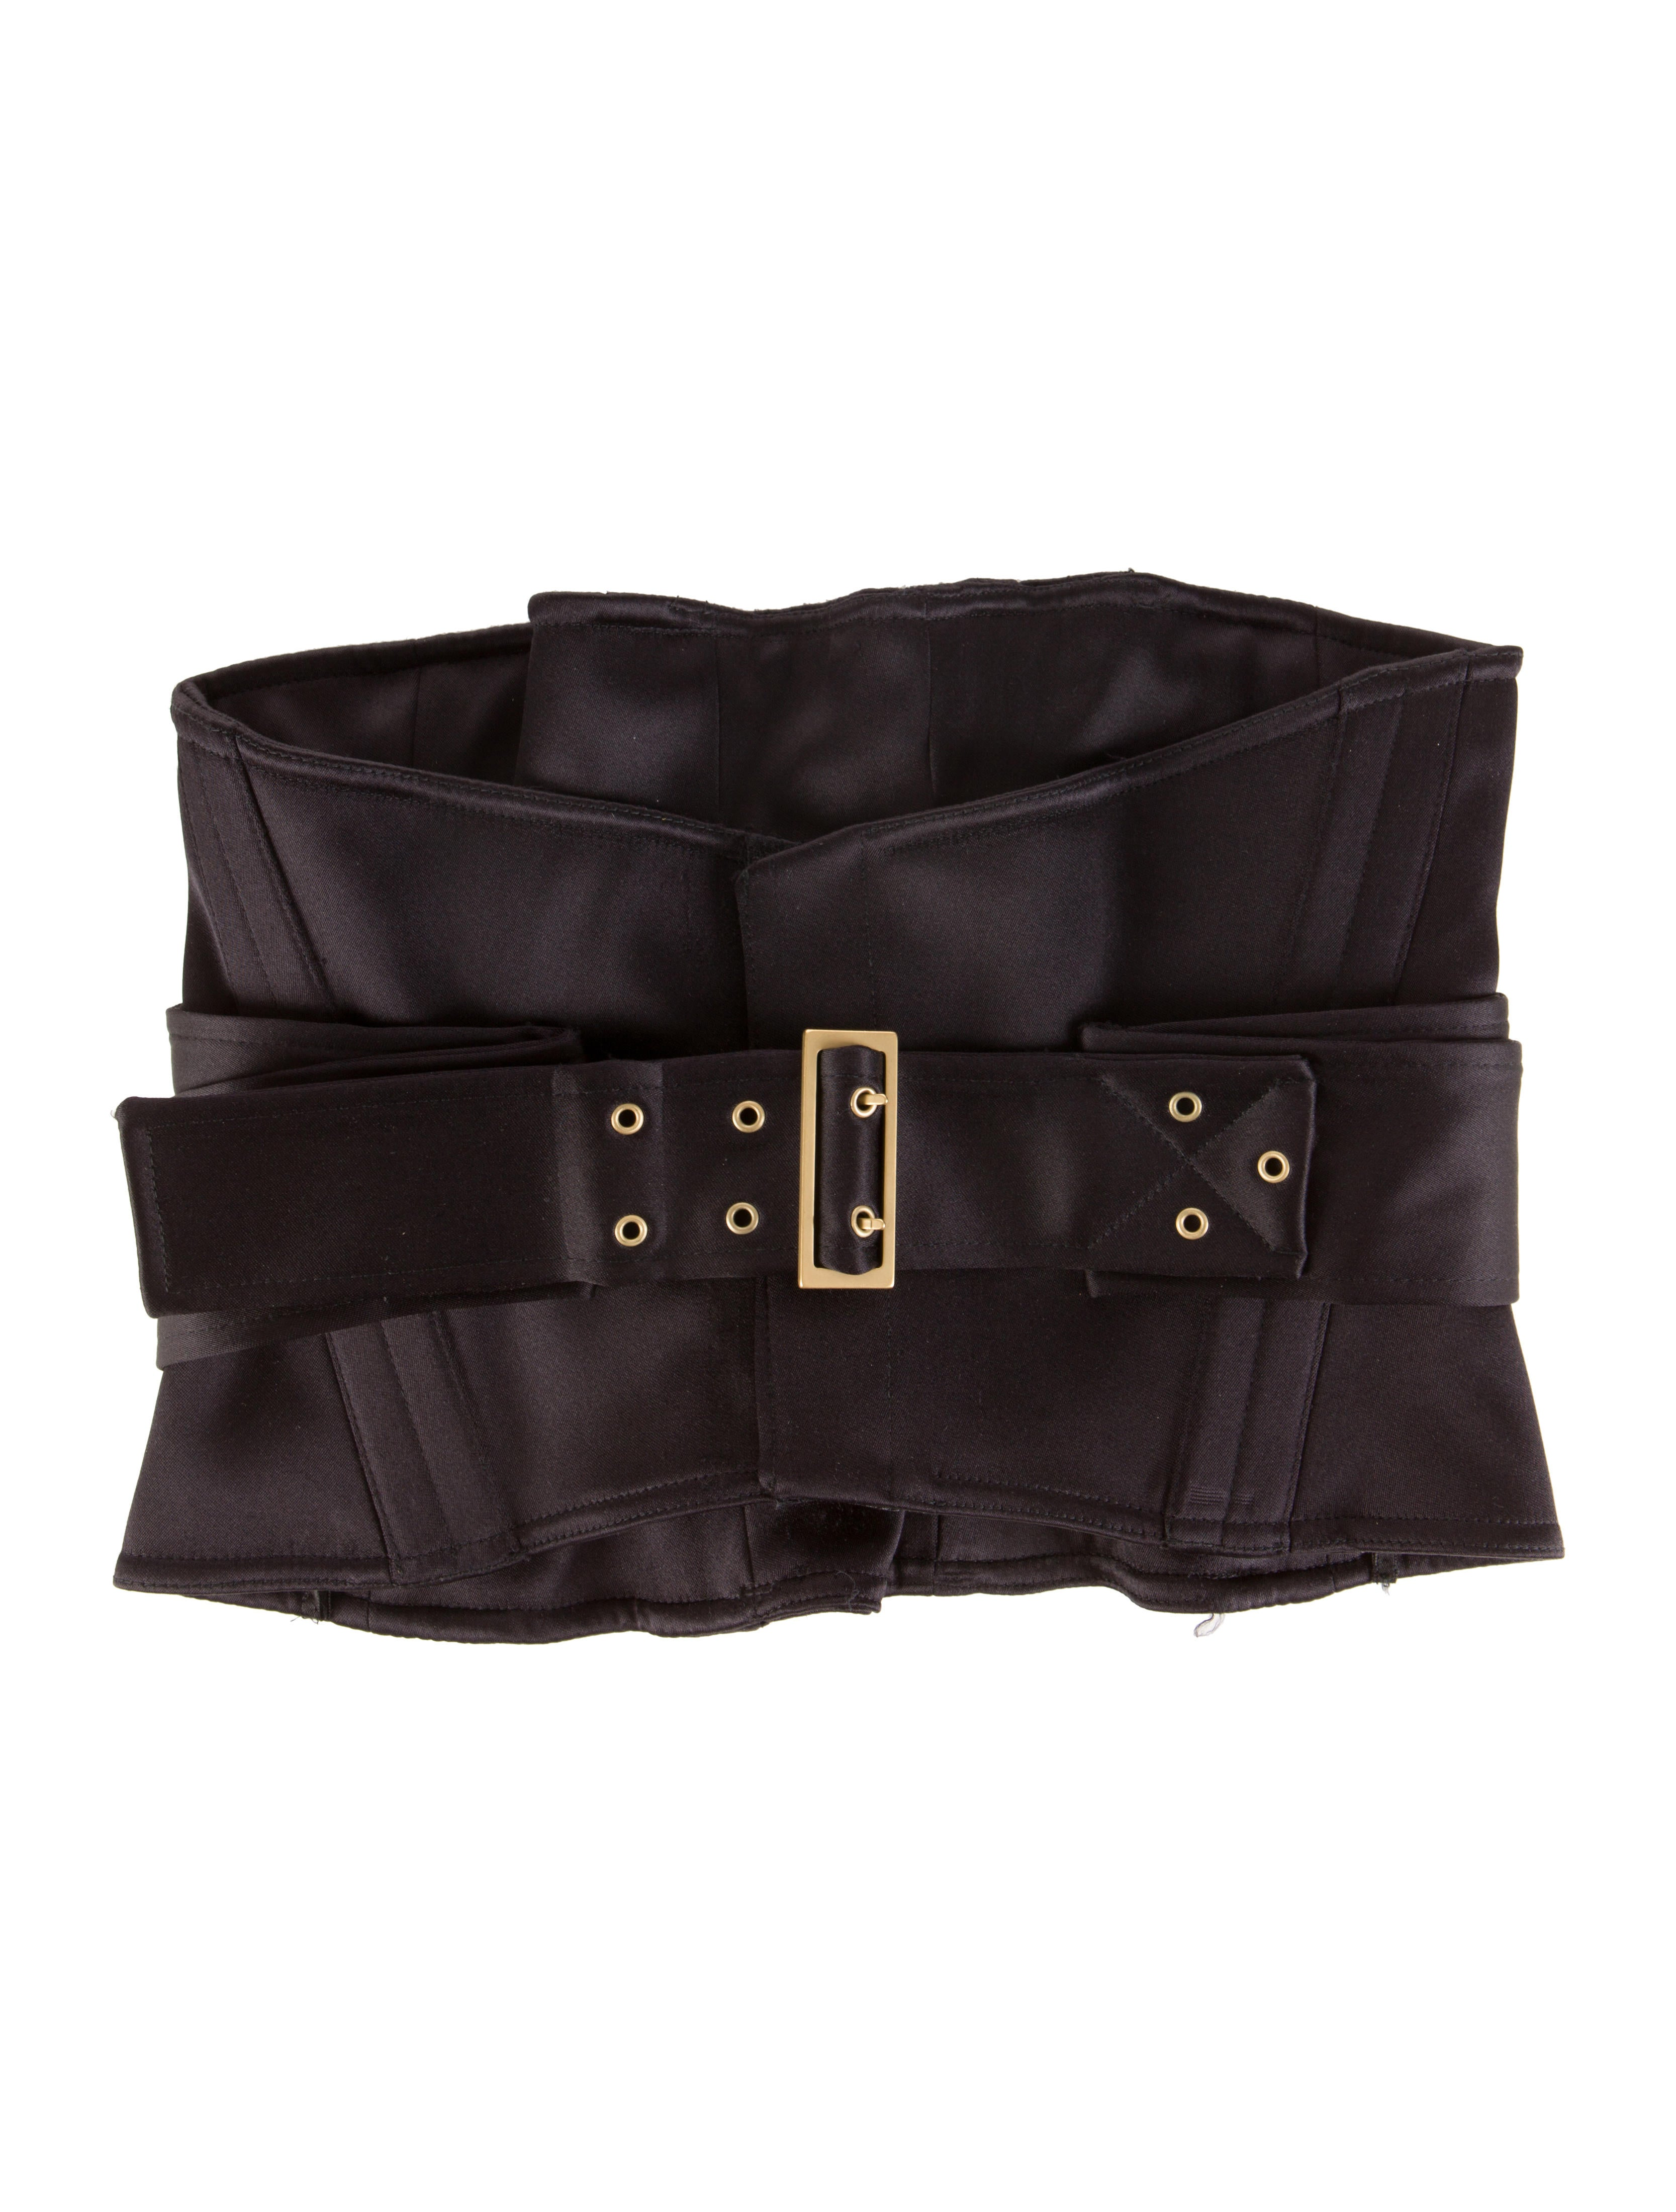 Gucci Corset Belt - Accessories - GUC67752